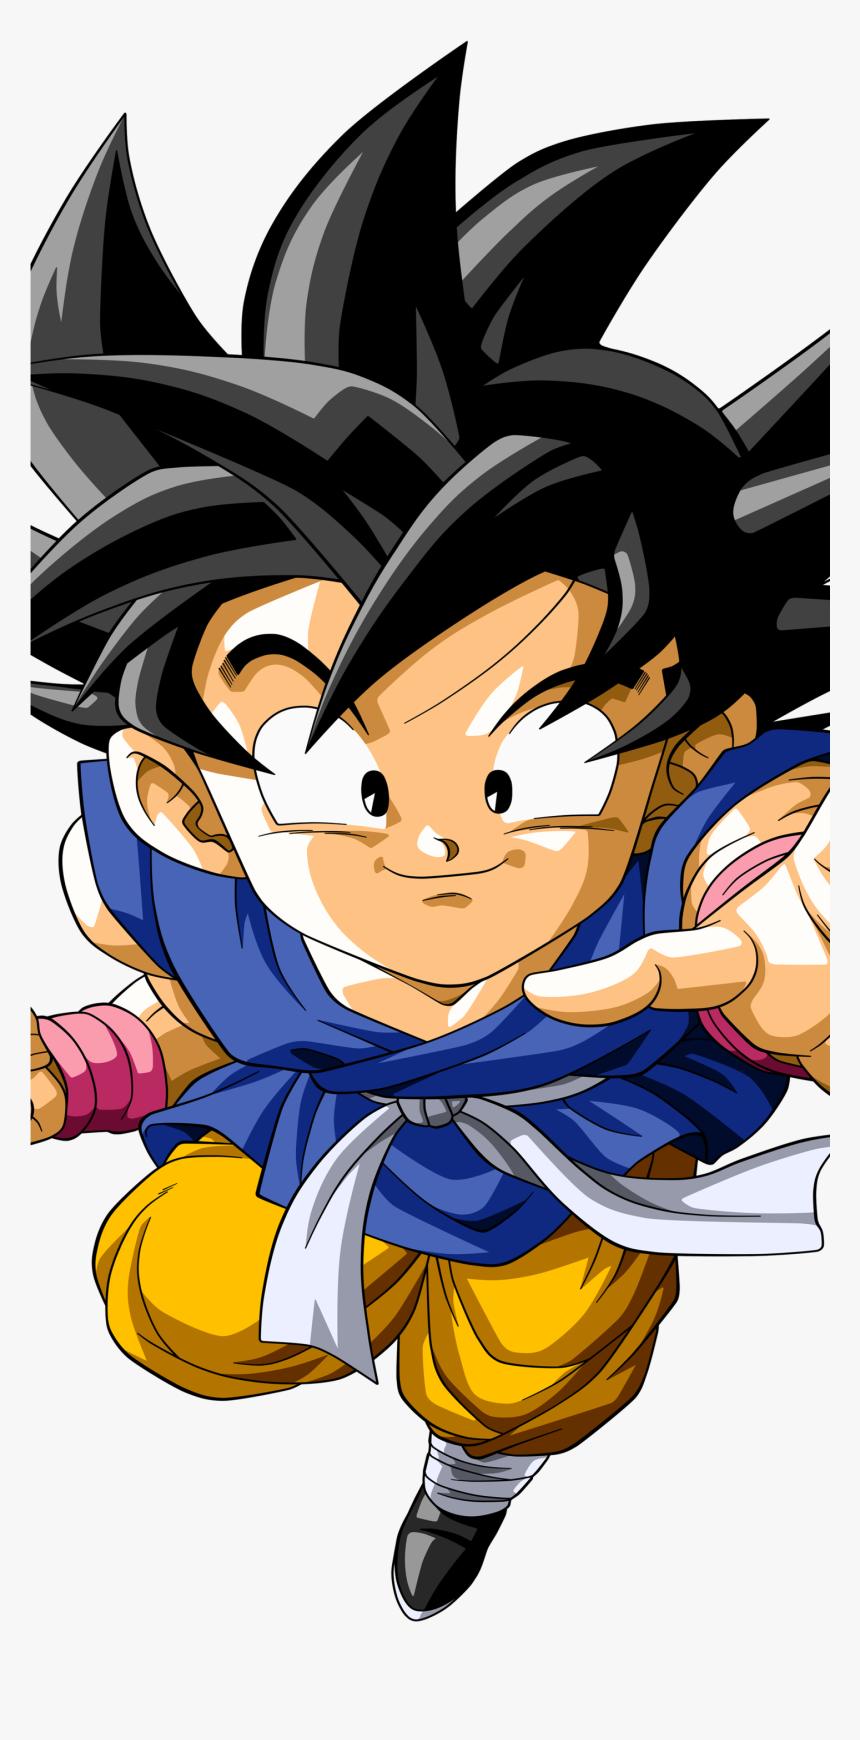 Kid Goku Anime / Dragon Ball Gt Mobile Wallpaper - Dragon Ball Gt Goku Fighter Z, HD Png Download, Free Download